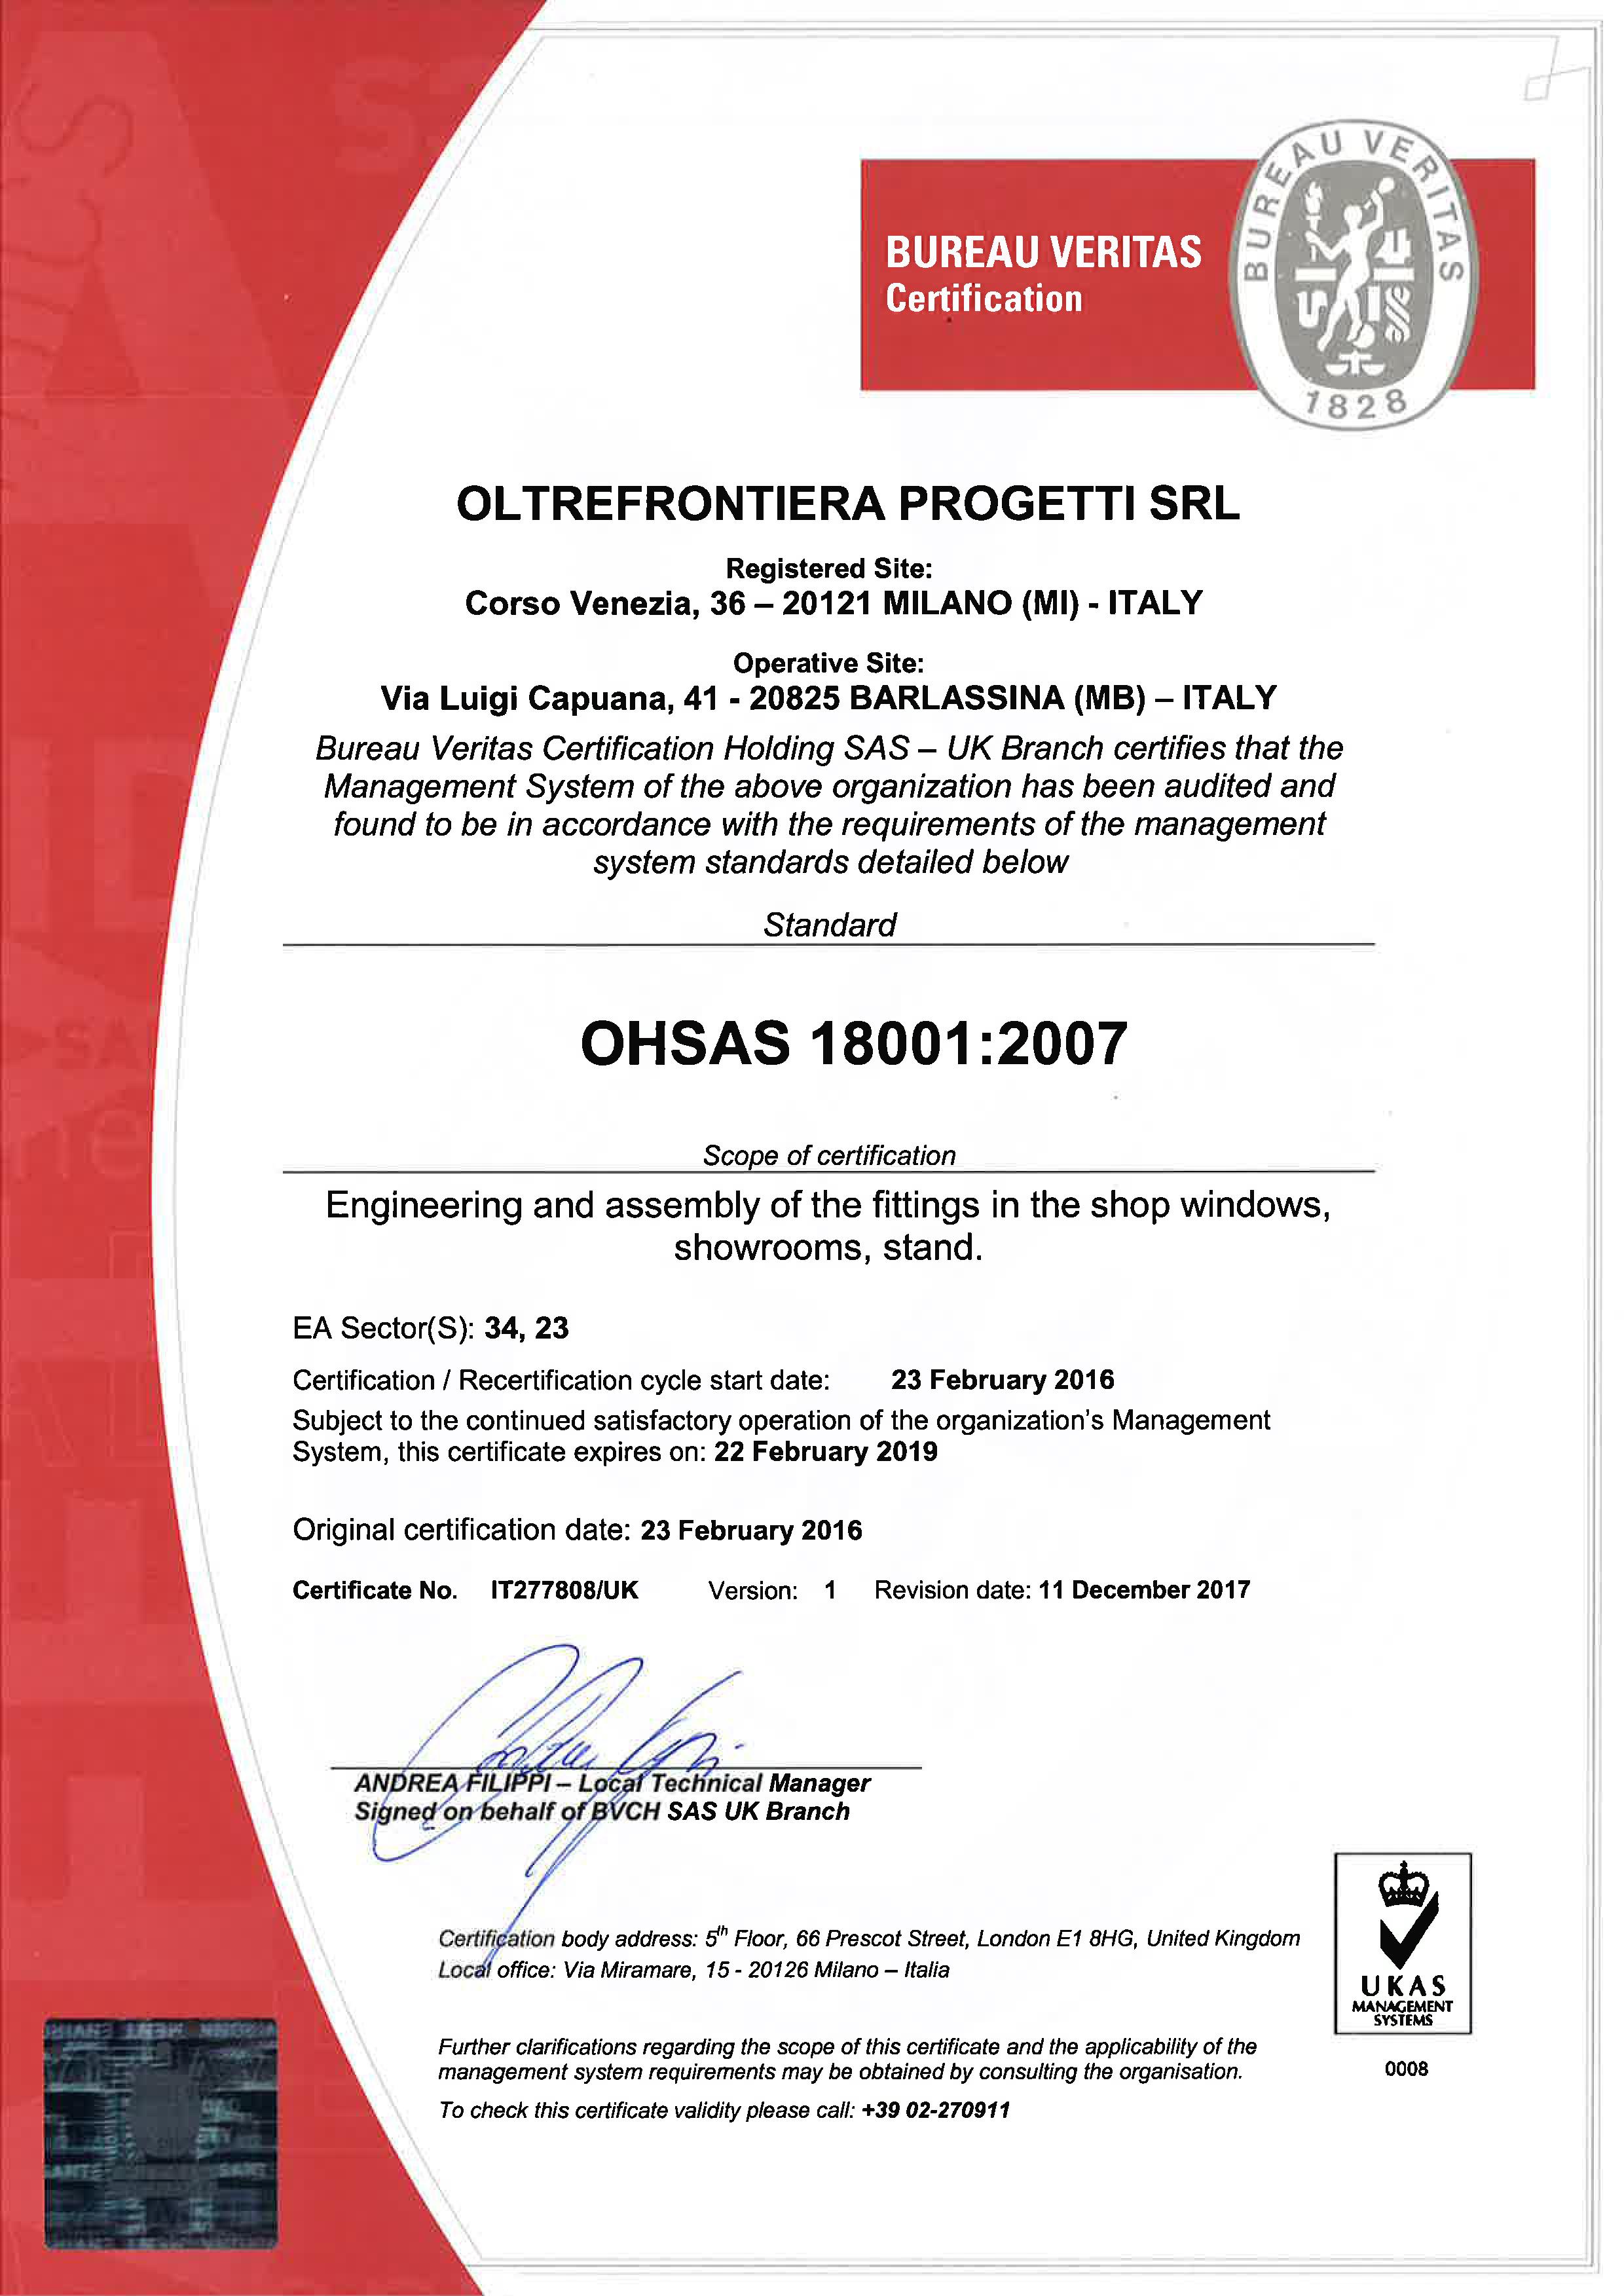 OLTREFRONTIERA PROGETTI SRL SCAN 18001 ING